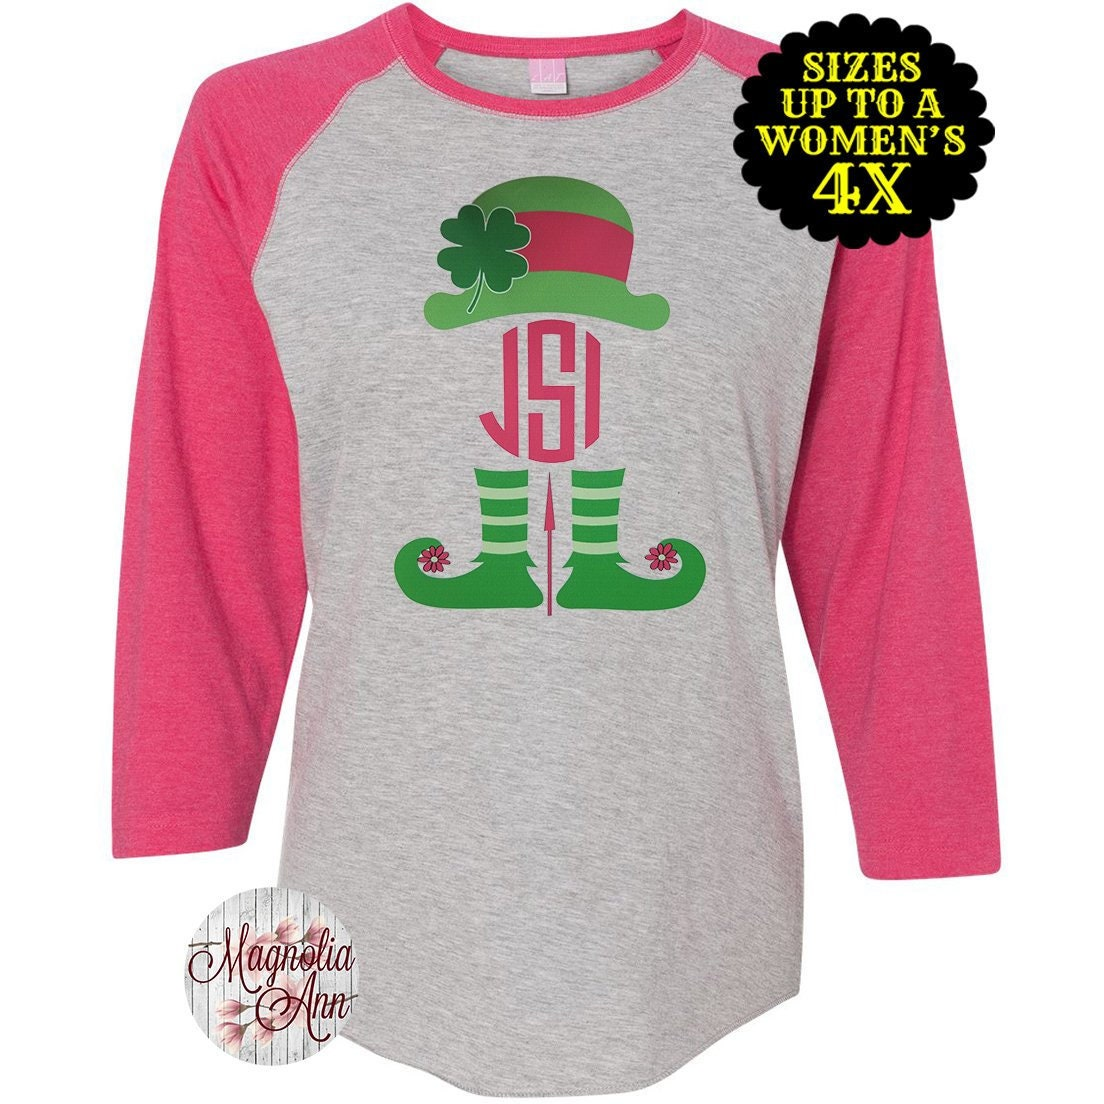 03b97d725 Leprechaun Monogram Shirt, St. Patricks Day Shirt, Matching St ...